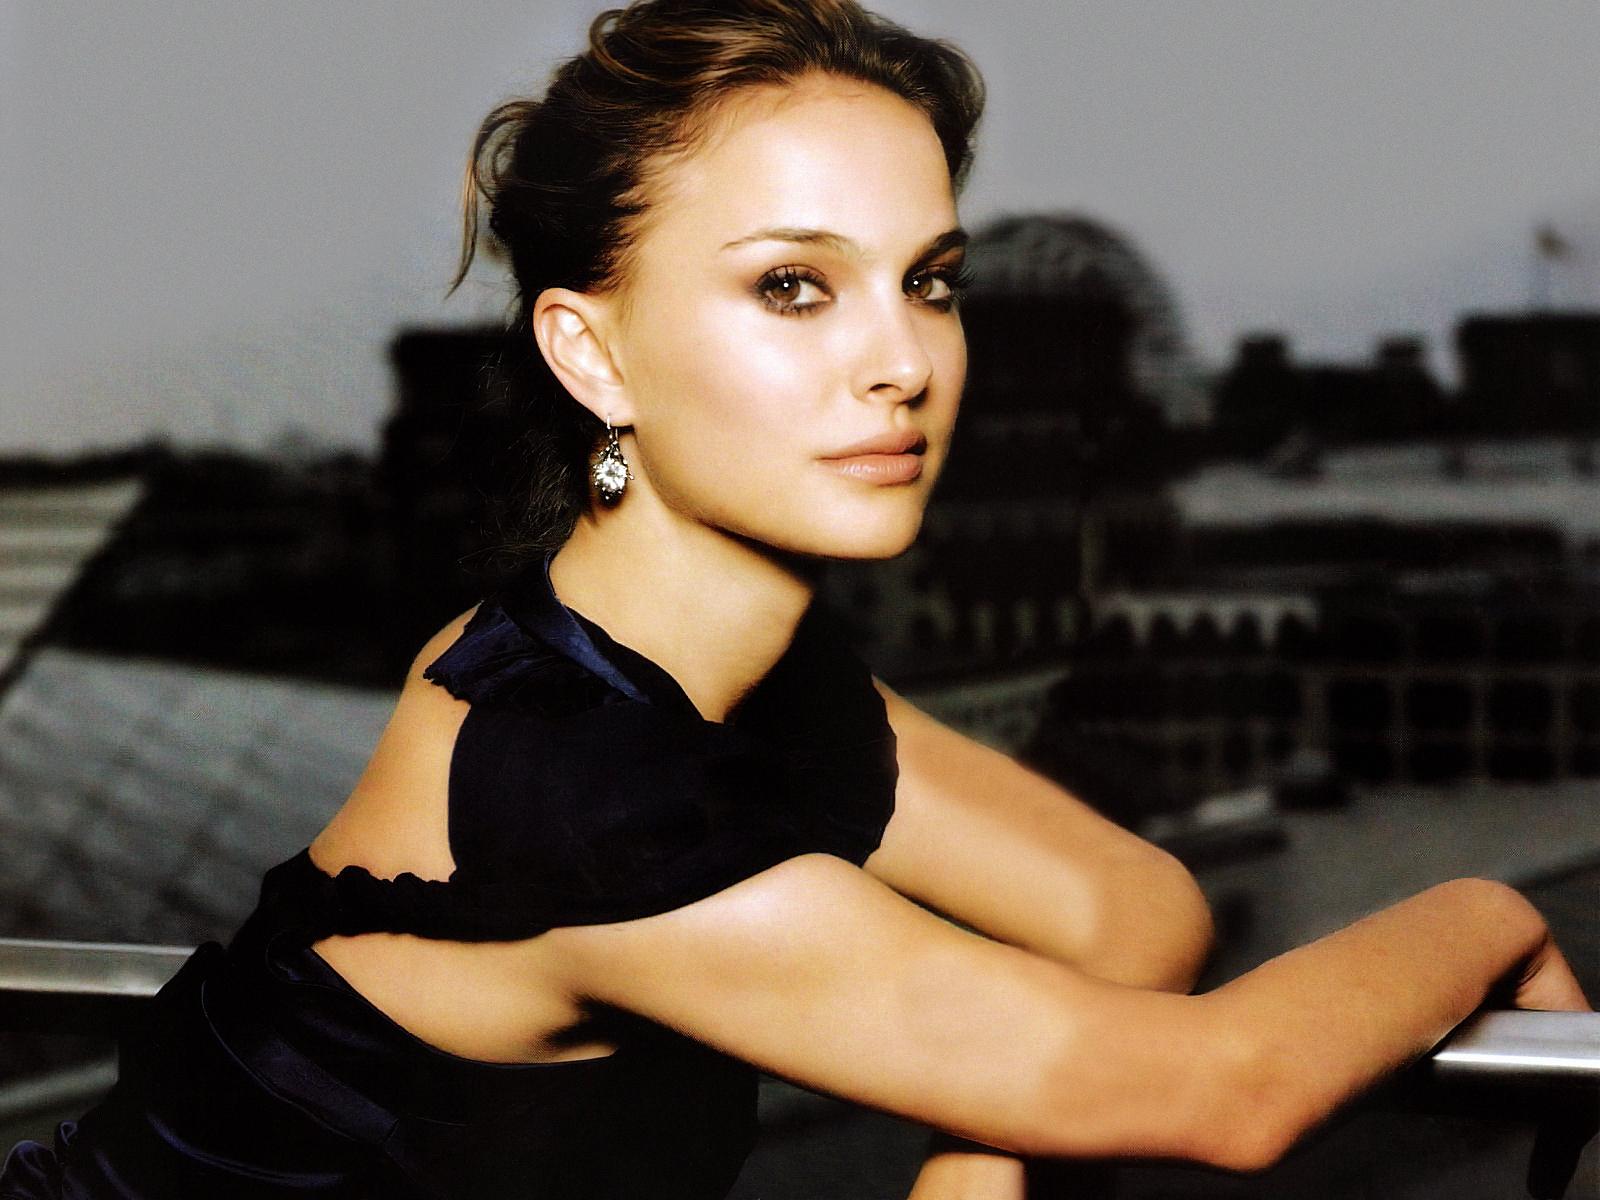 Uneedallinside Natalie Portman Latest Images  Hot Stills -8900